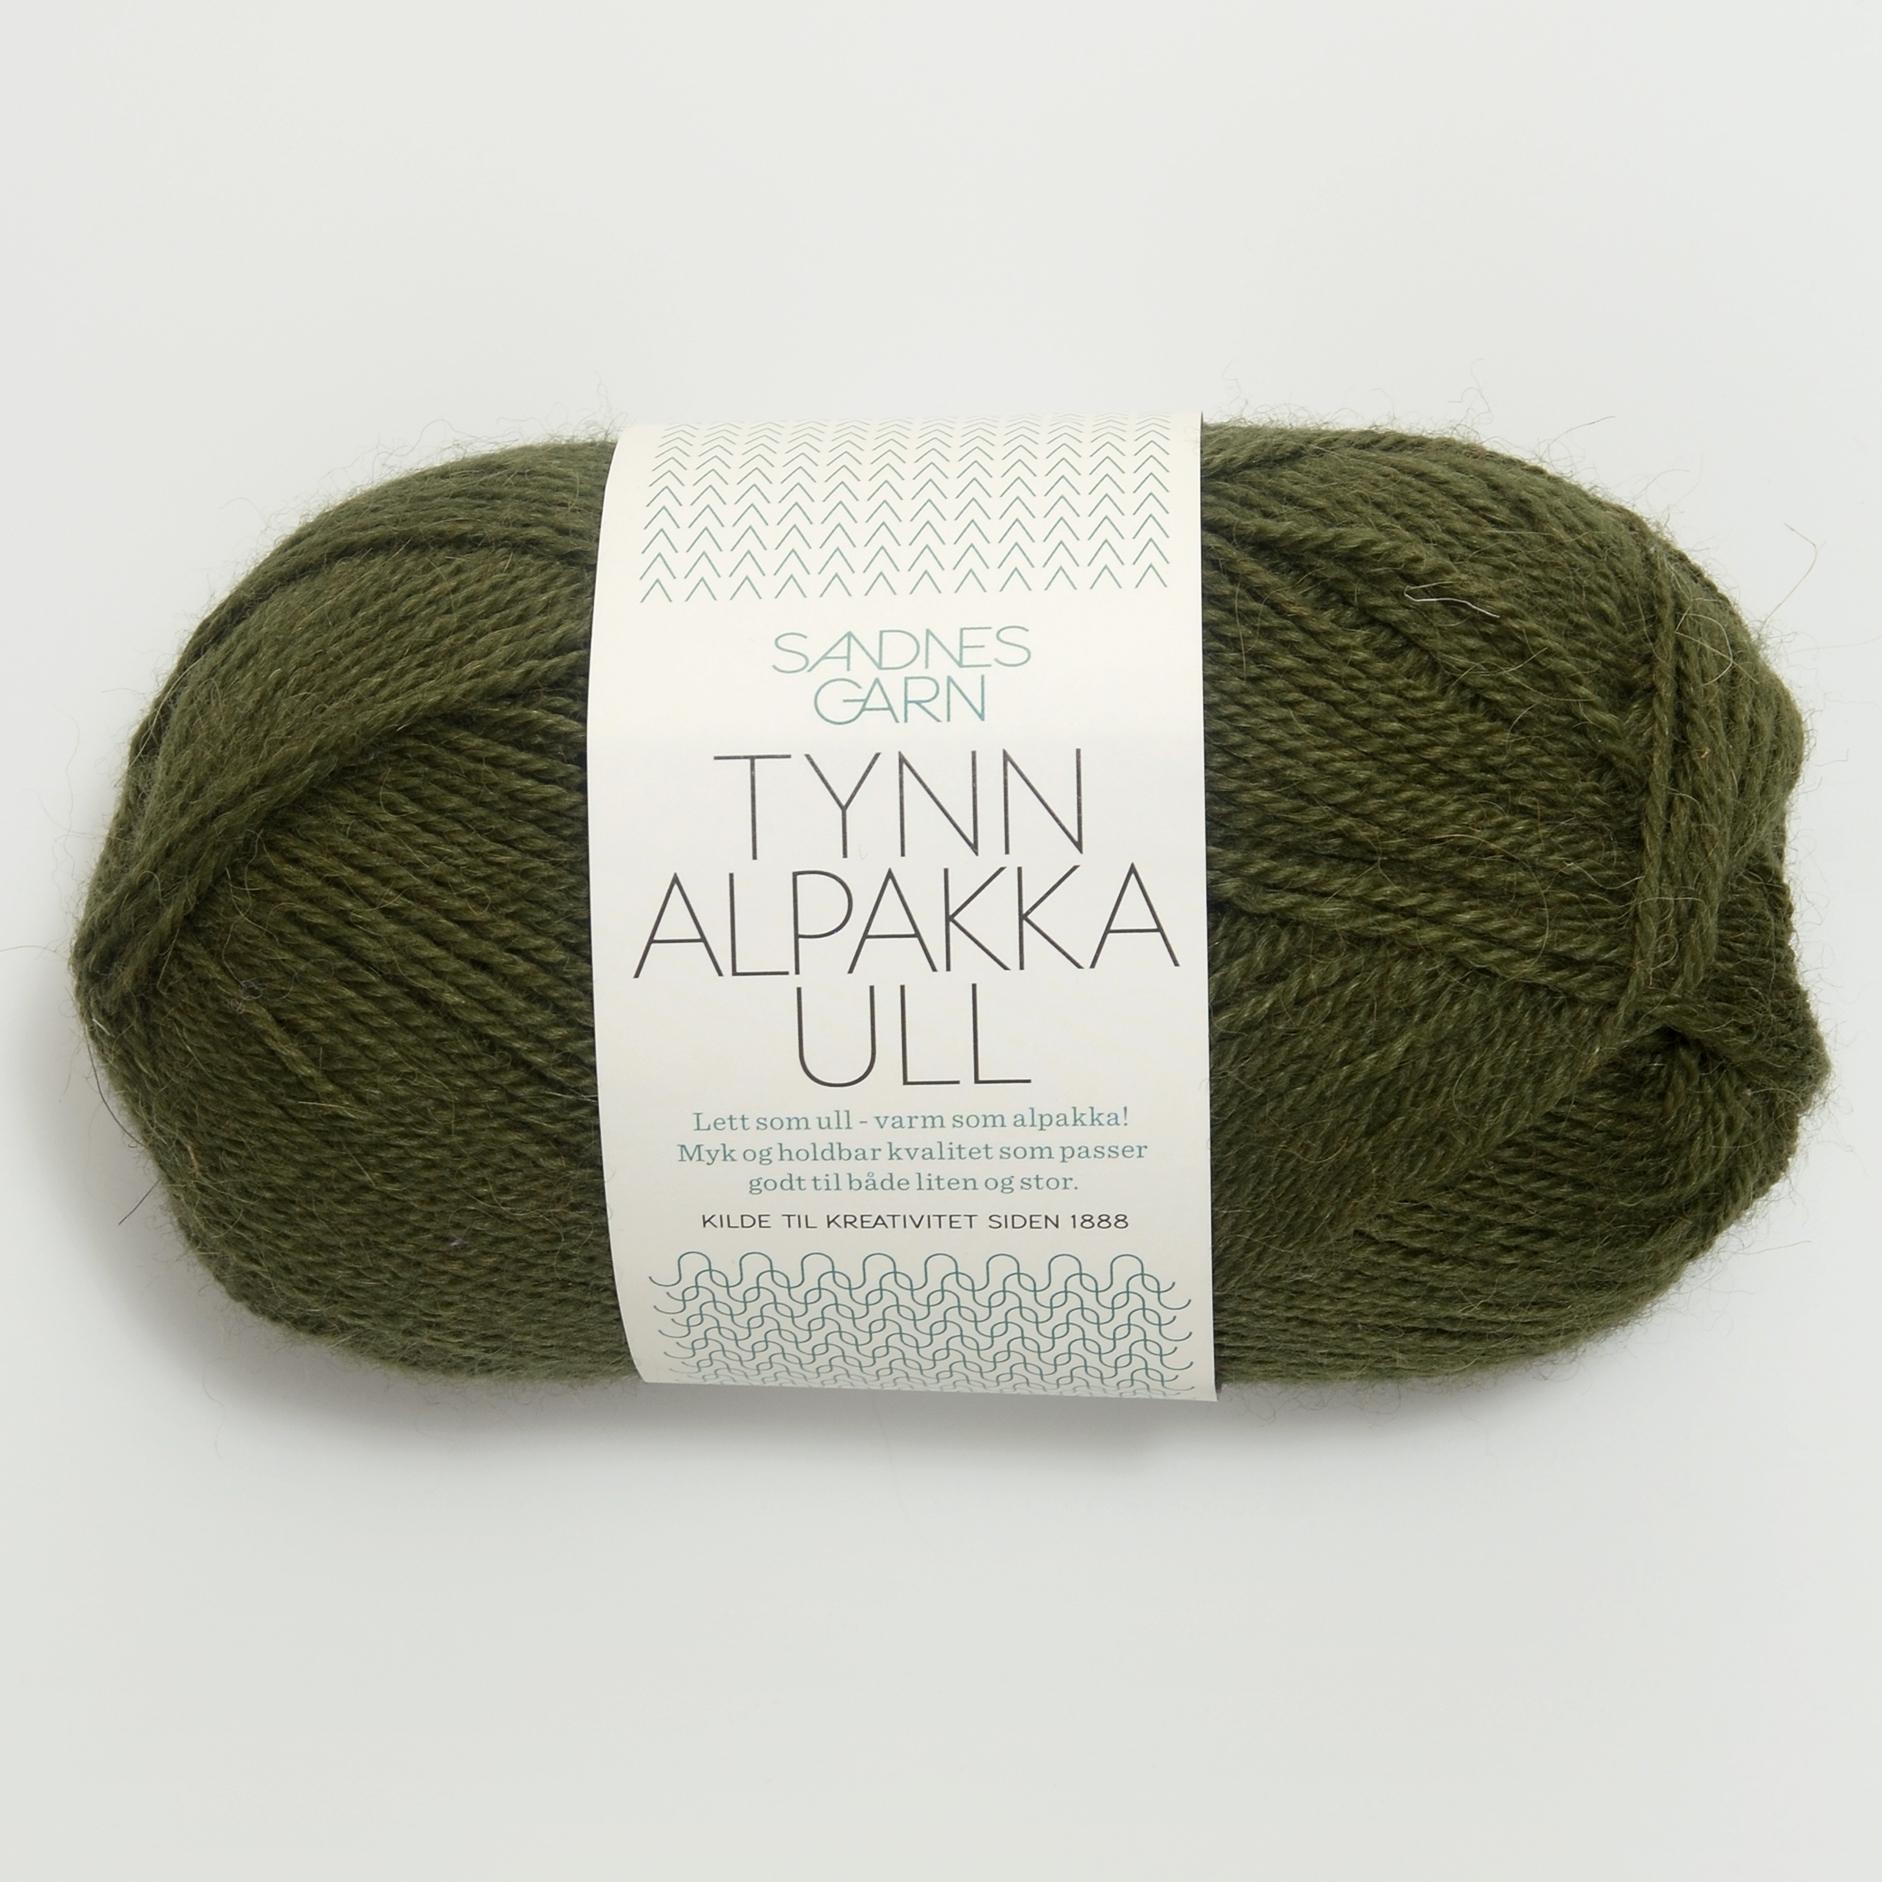 Tynn alpakka/ull